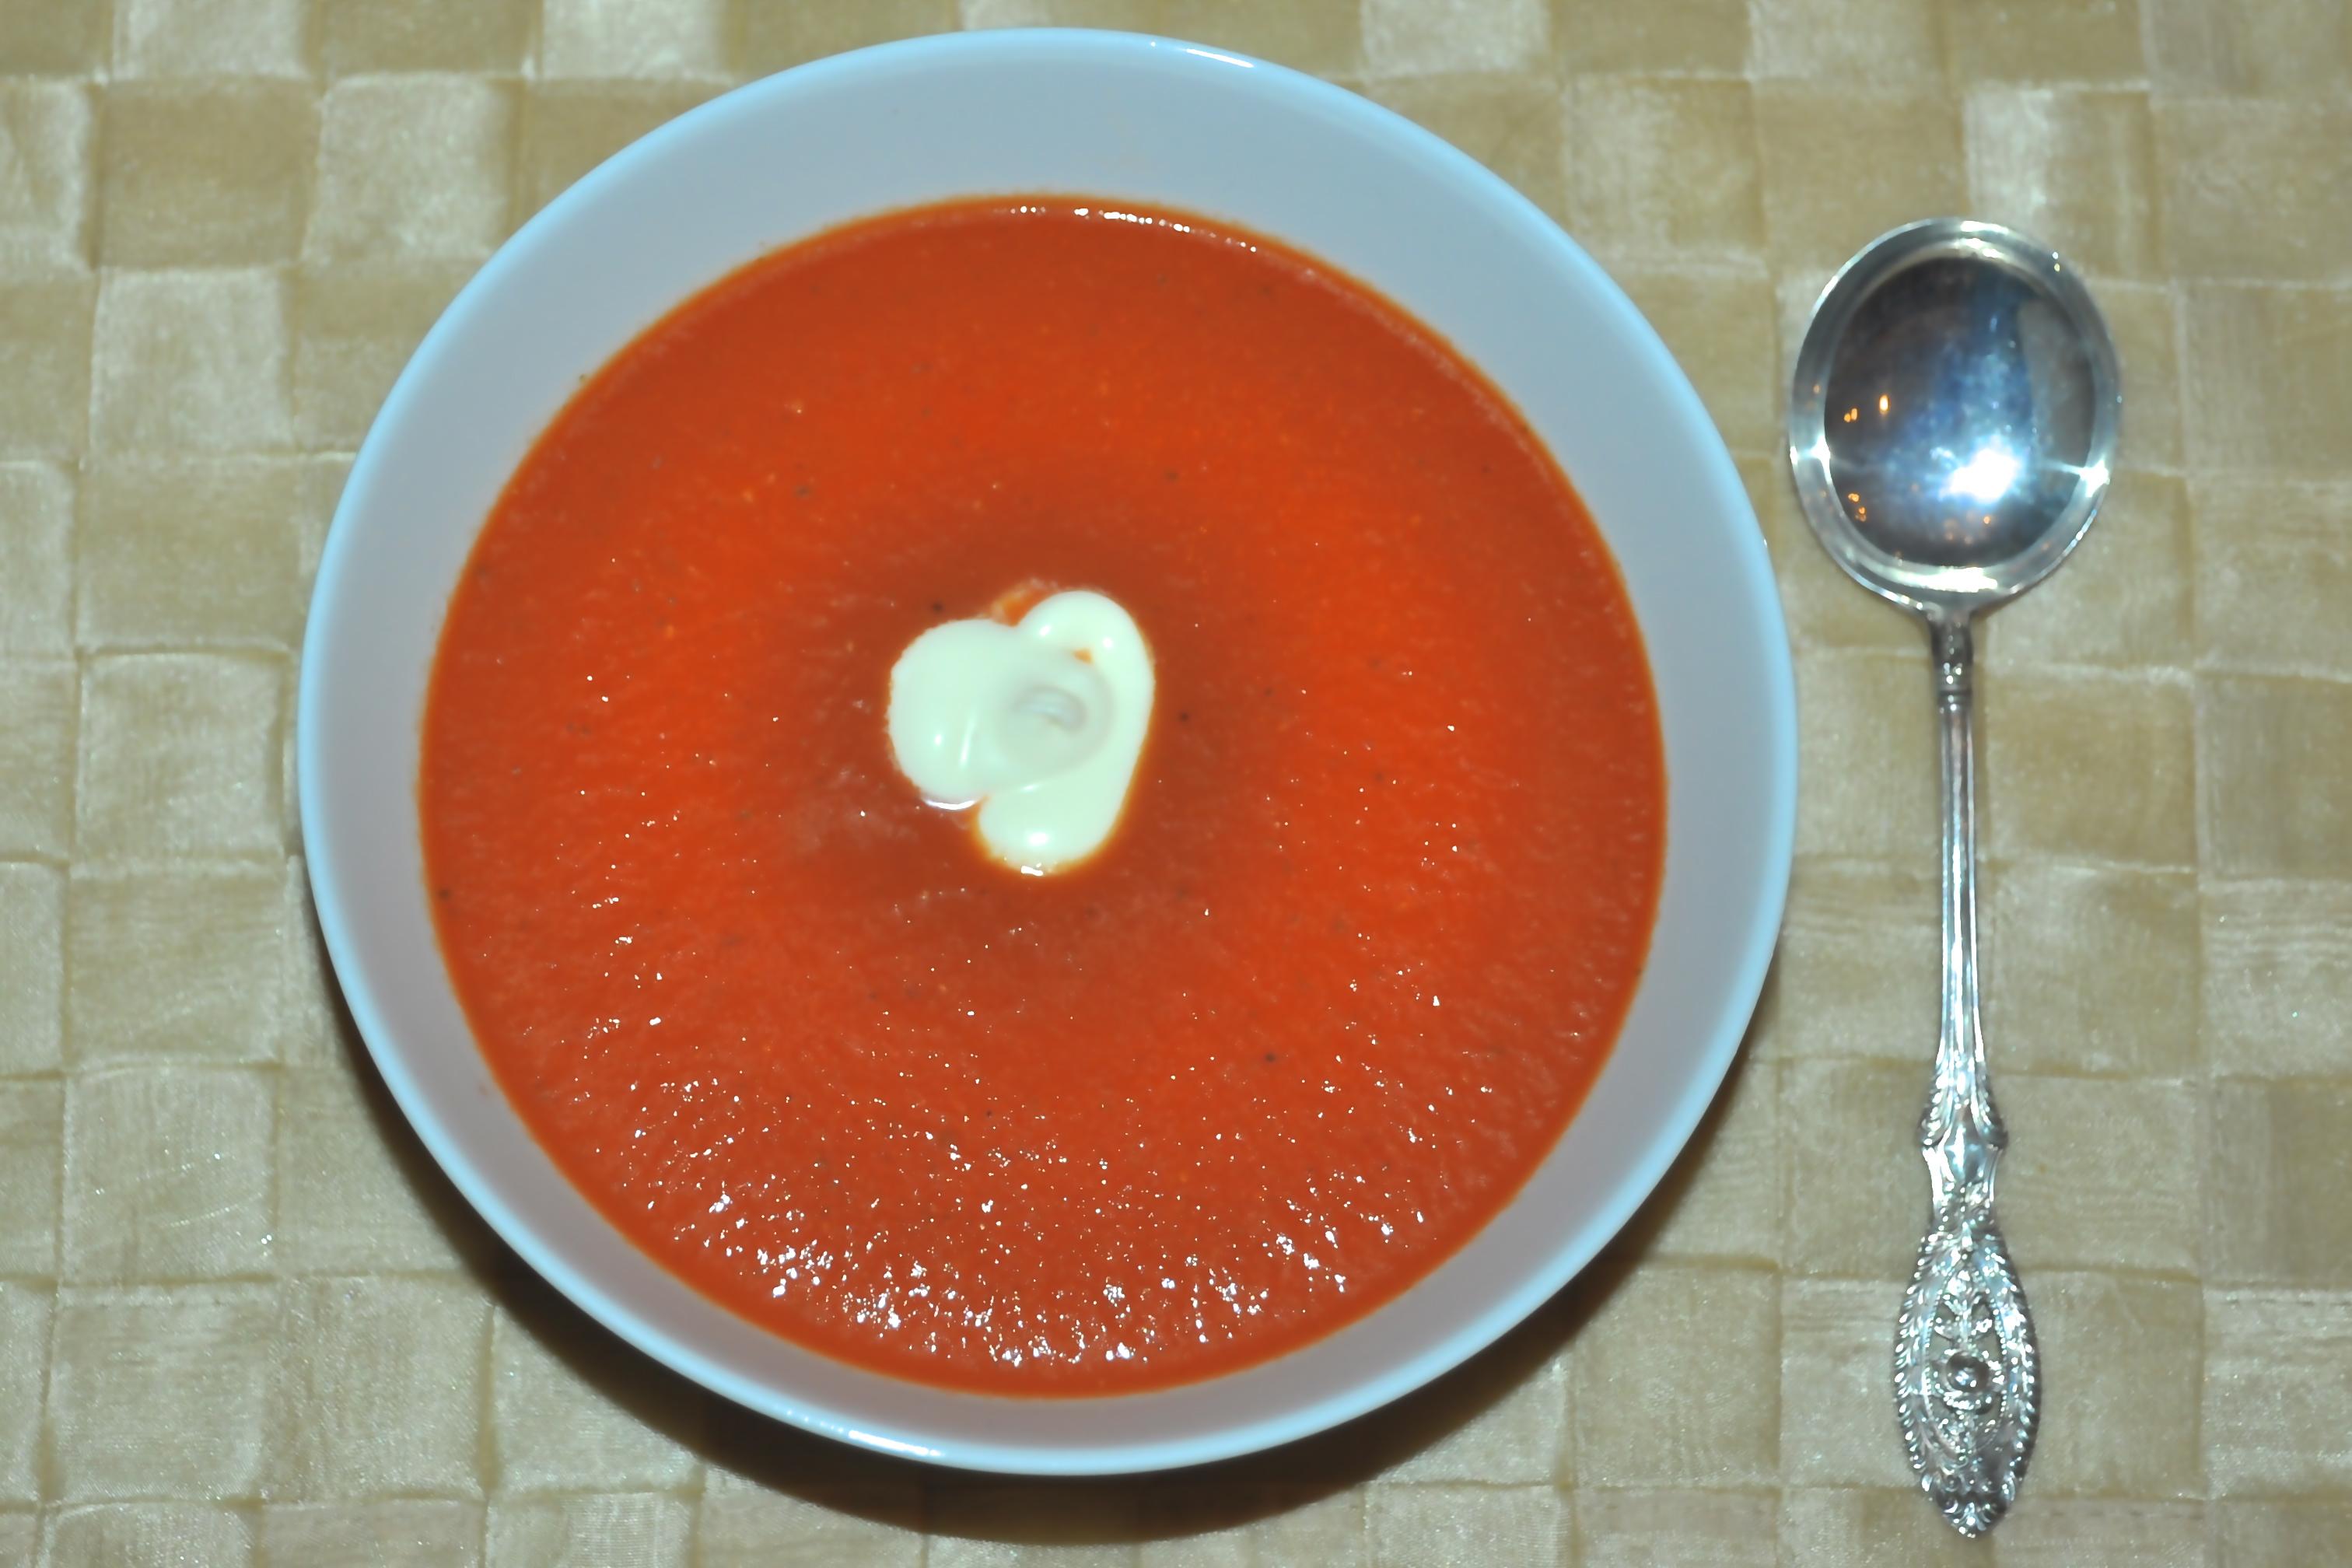 Spicy Tomato Soup Andrea Reiser